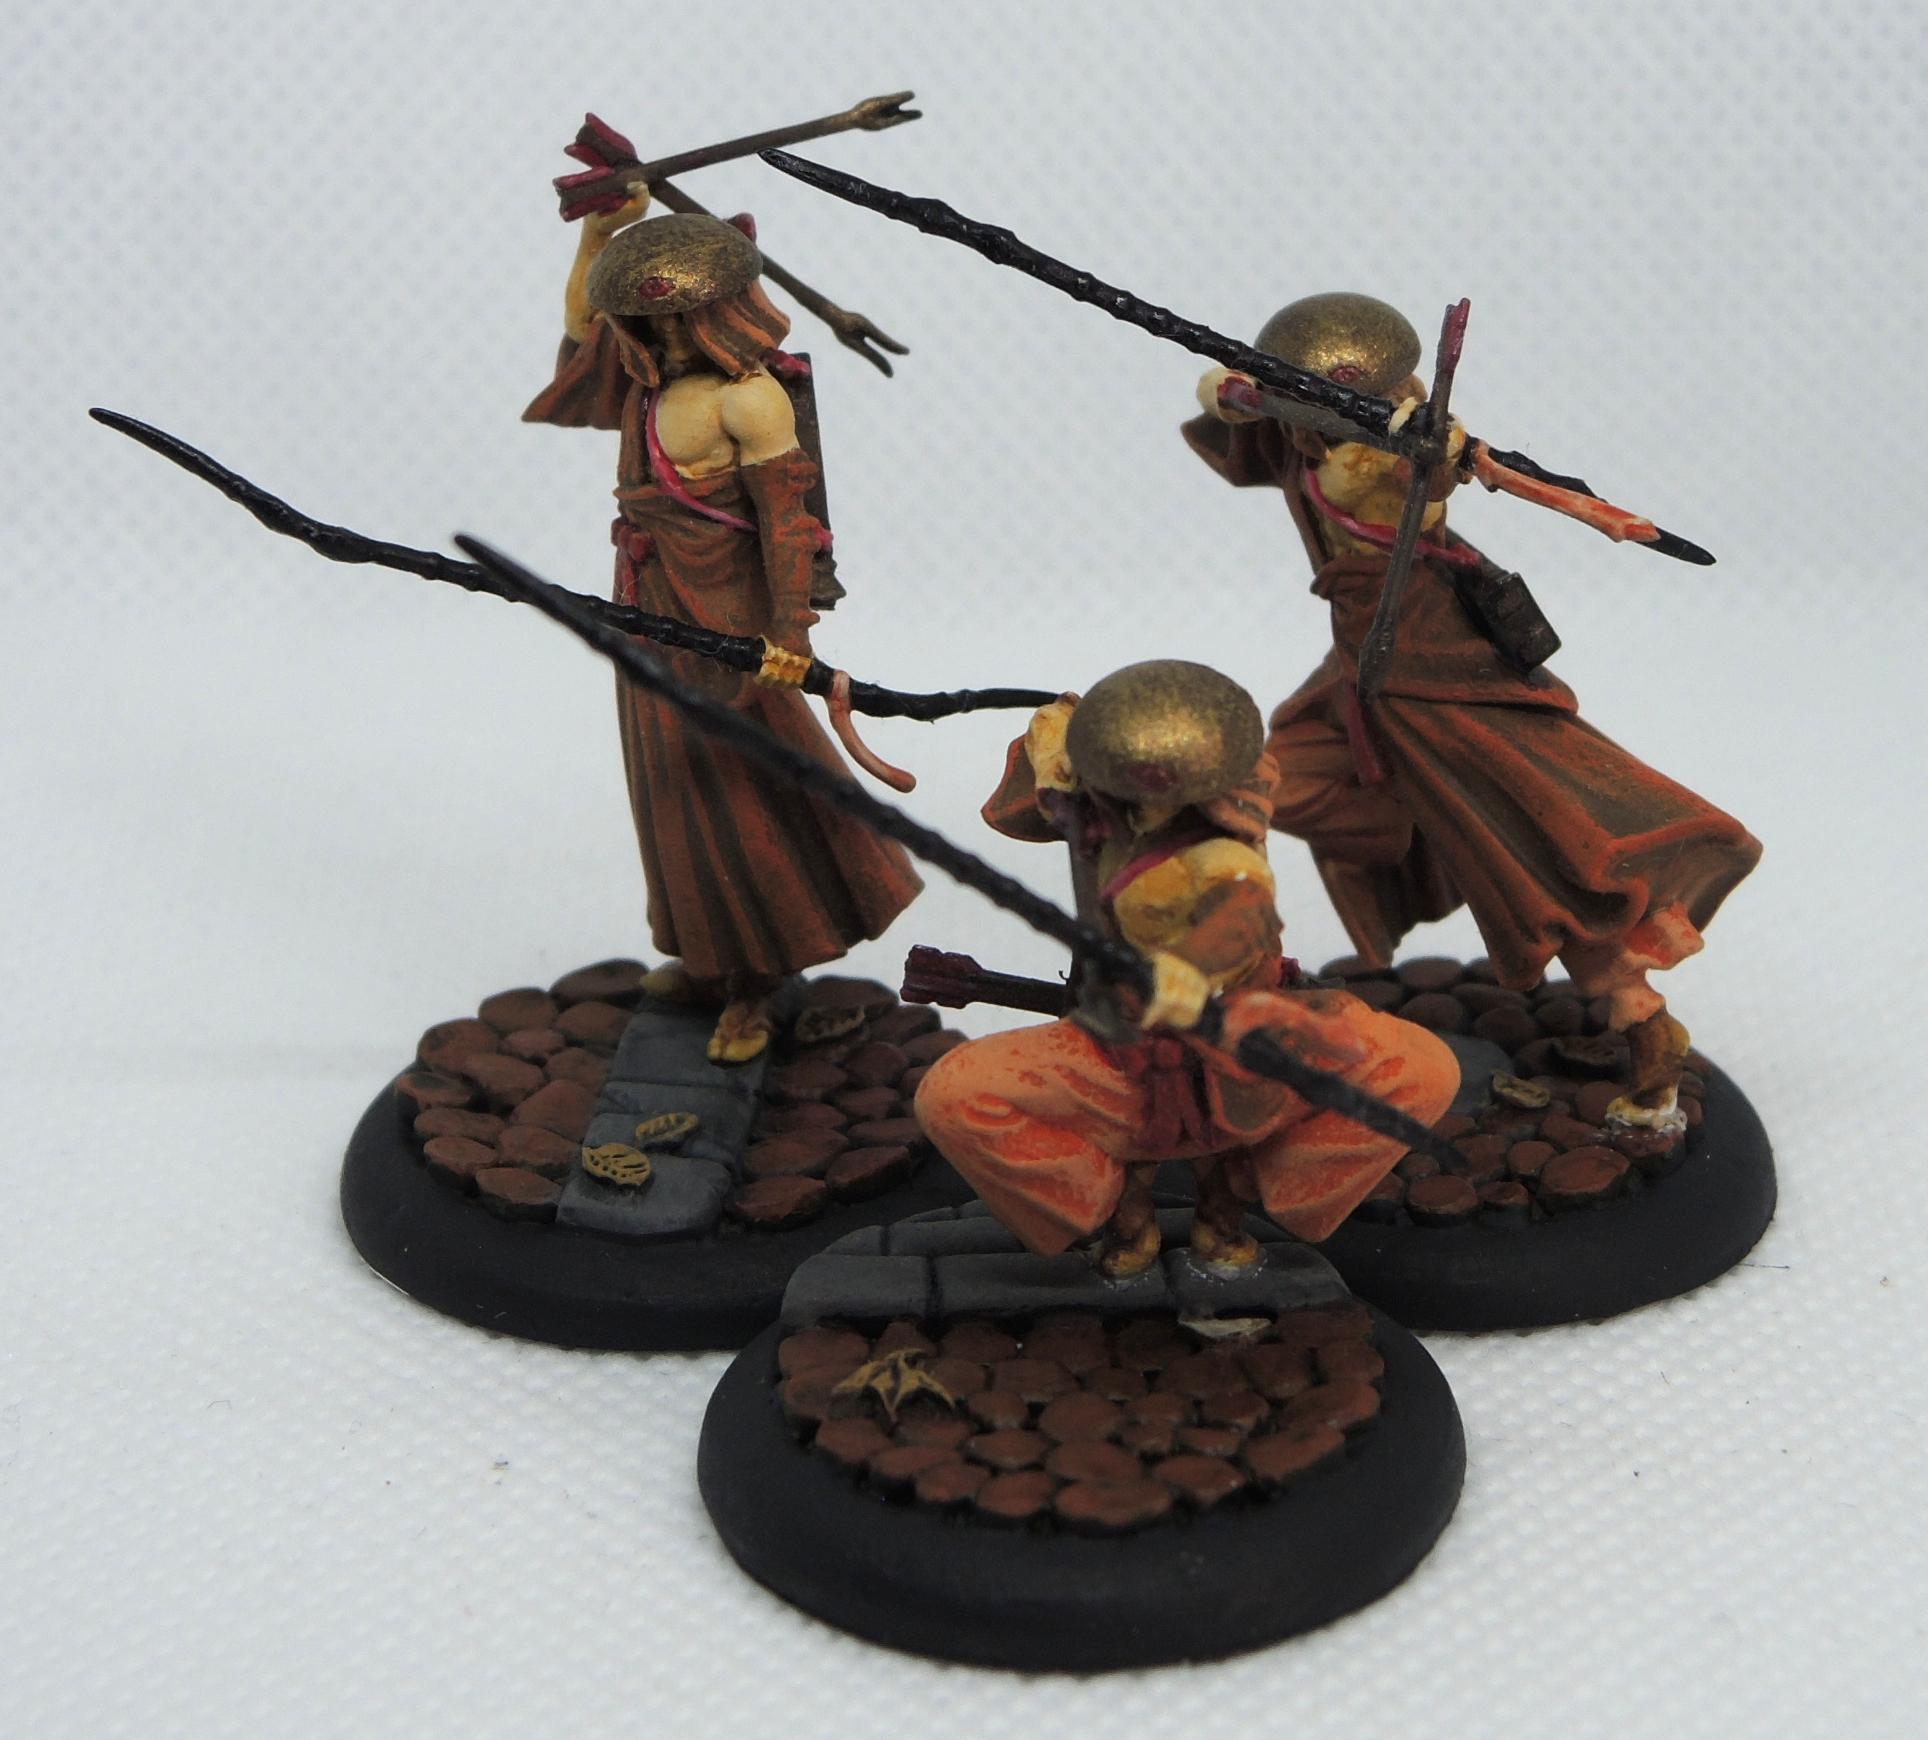 Last Blossom, Malifaux, Monk, Ten Thunders